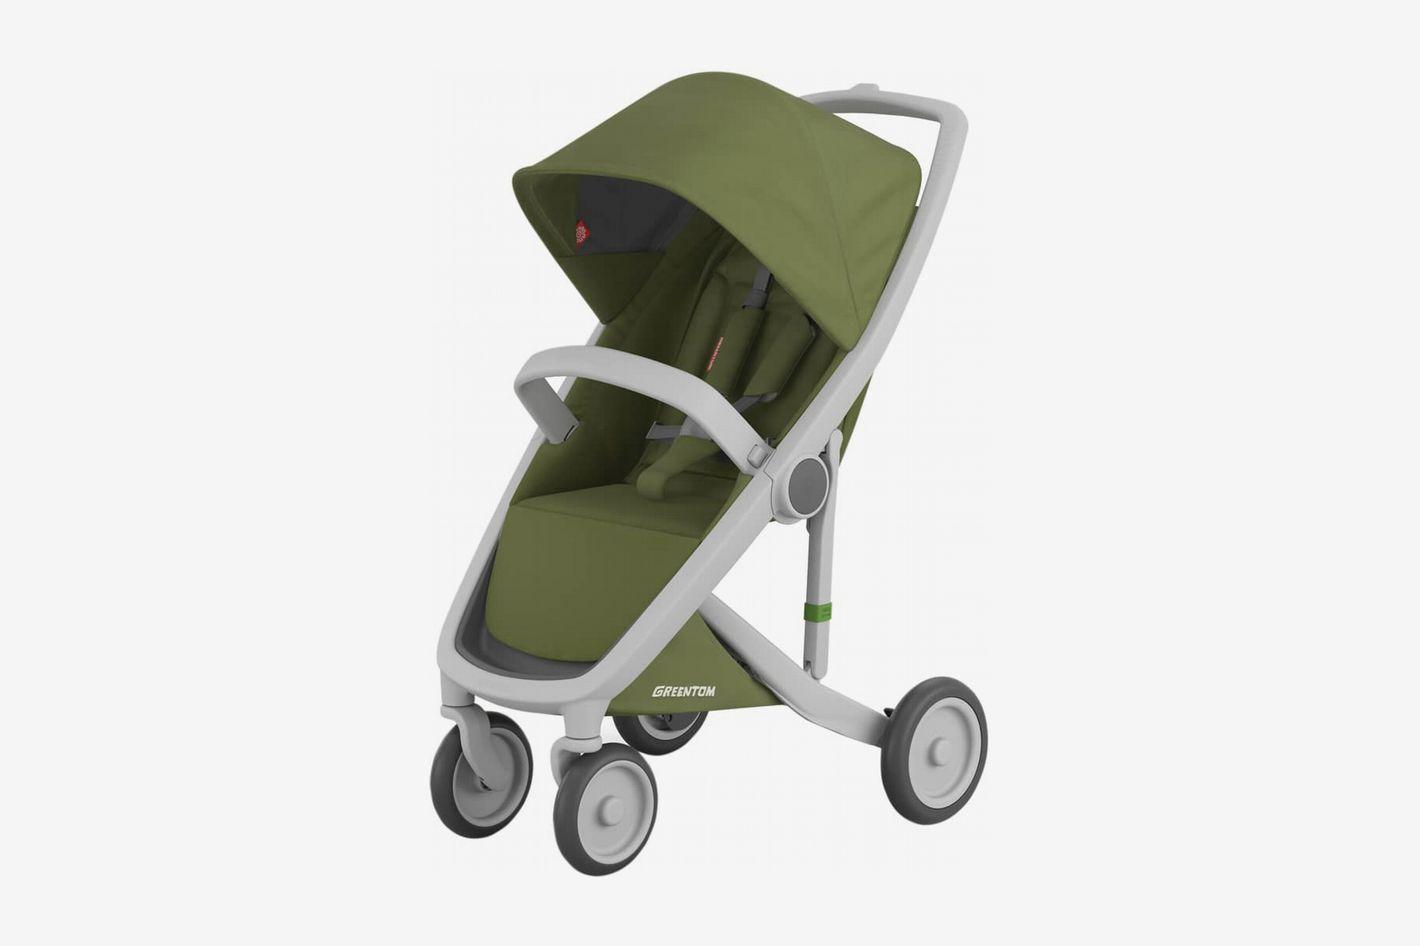 Greentom Classic Stroller